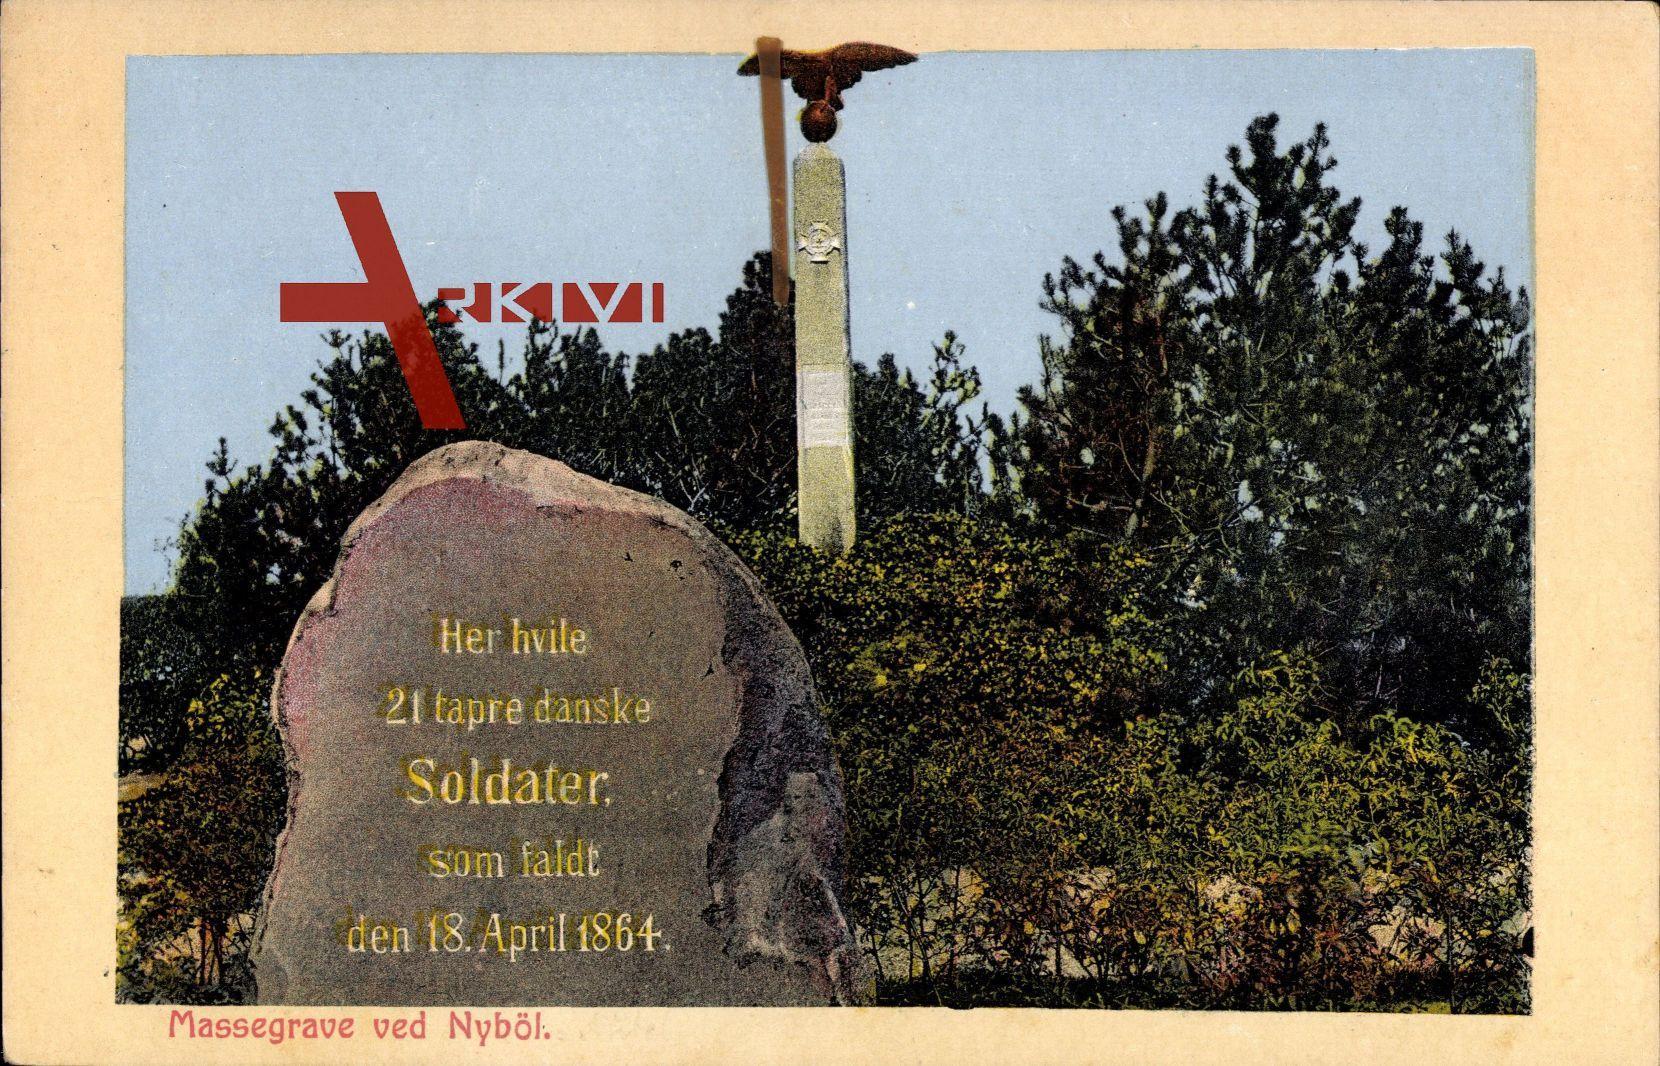 Nyböl Sogn Dänemark, Massegrave, Gedenkstein, 18. April 1864